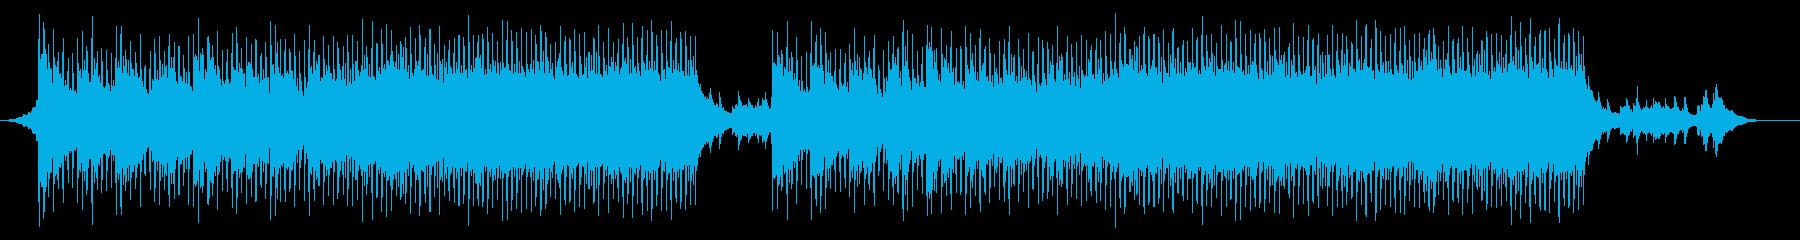 Snow Whiteの再生済みの波形